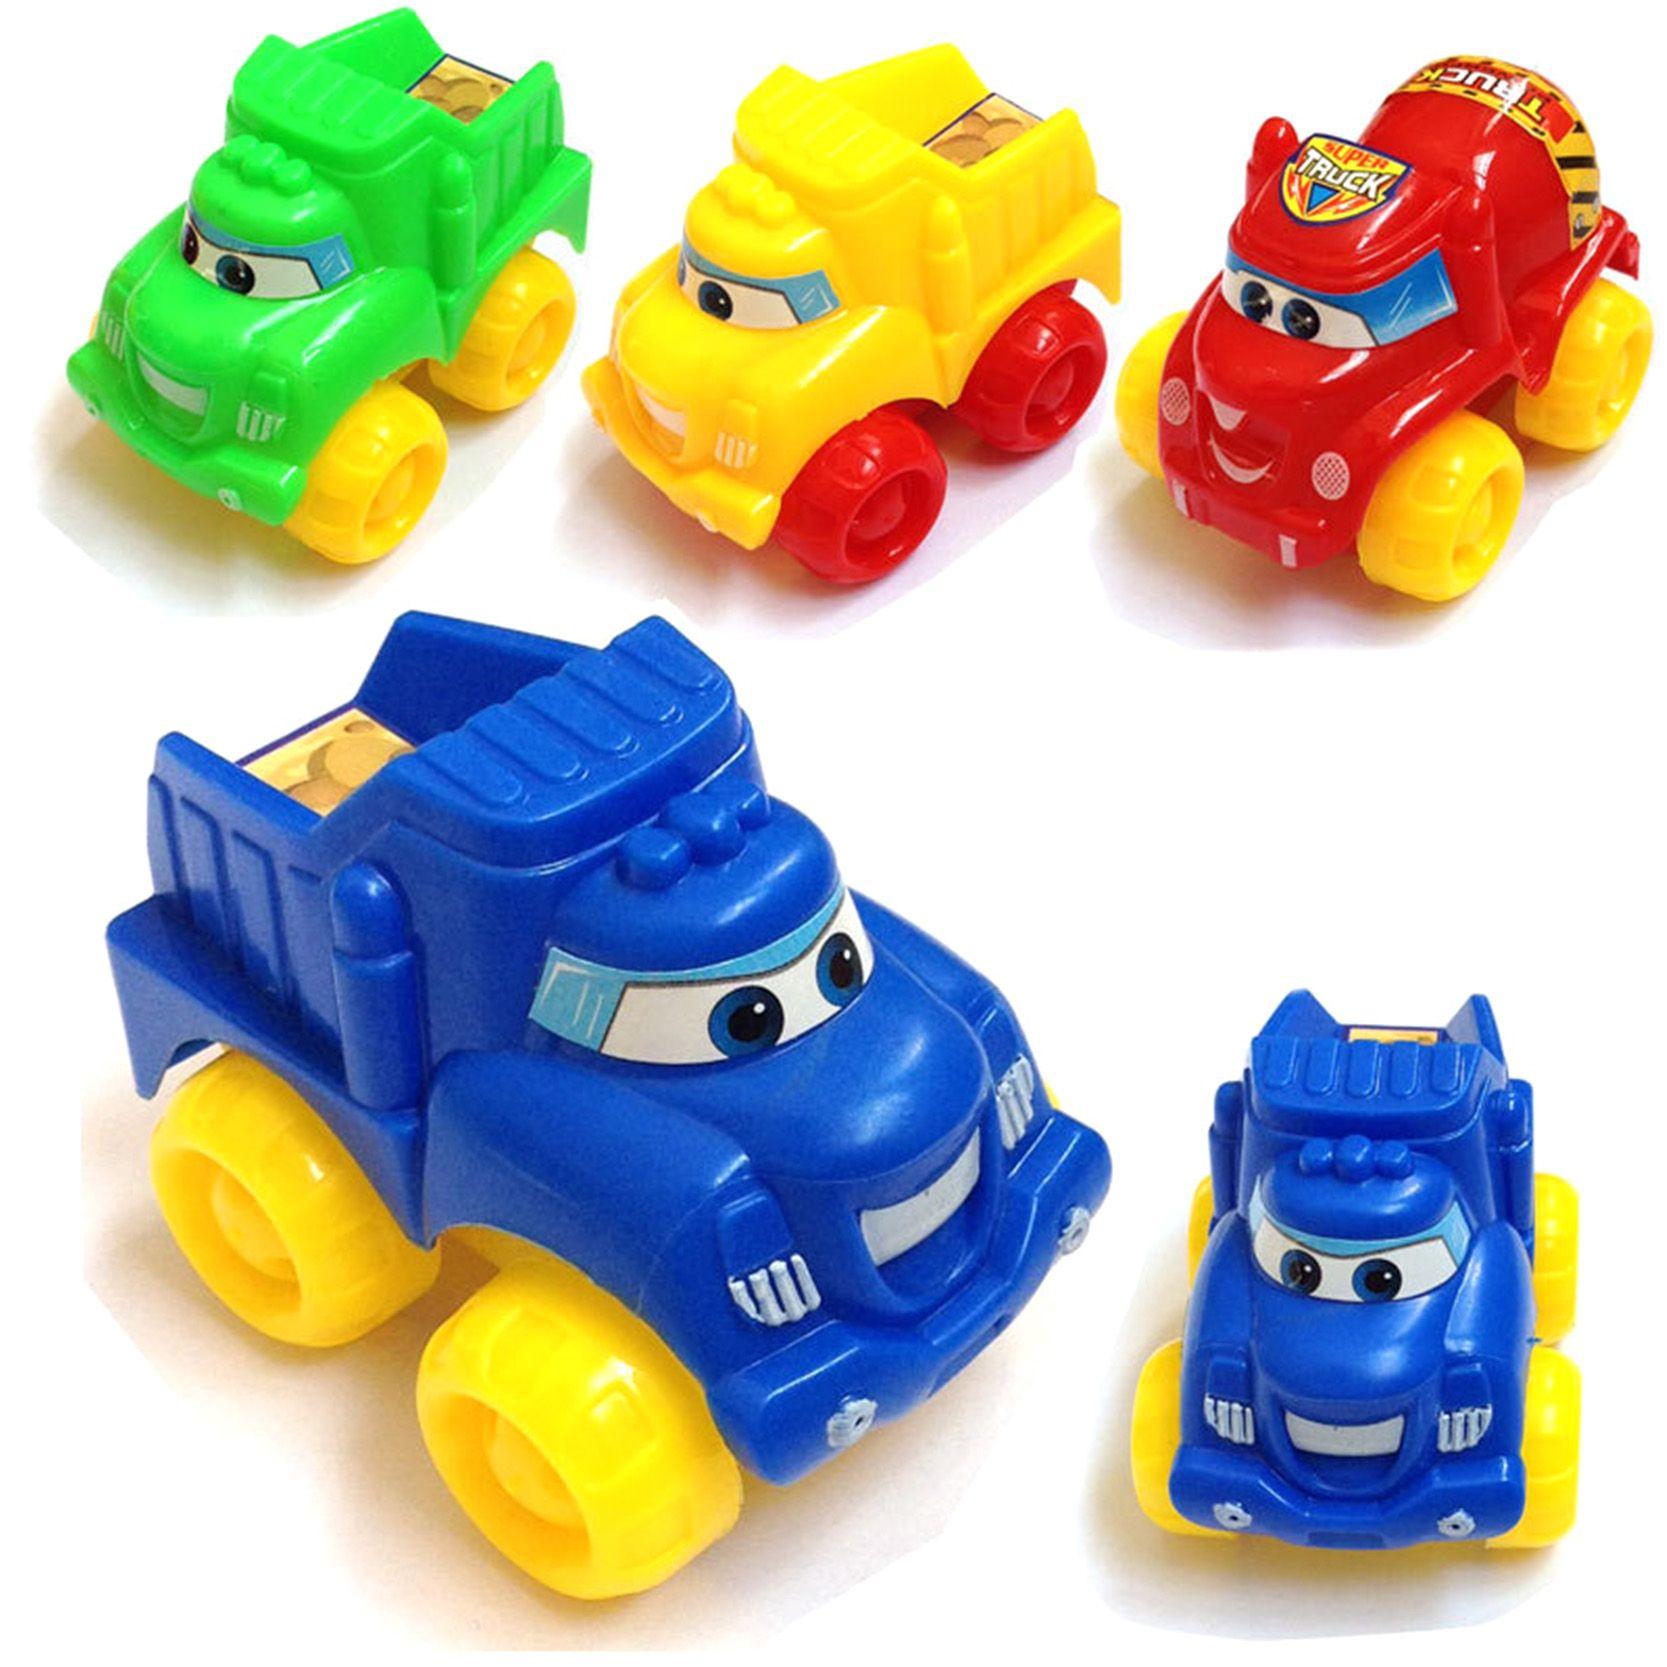 Kawaii Candy Color Cartoon Anime Smile Toys Cars For Kids Boys Children Diecast Pull Back Model Car 4 Pcs Rand Petites Voitures Voiture Jouet Modele De Voiture